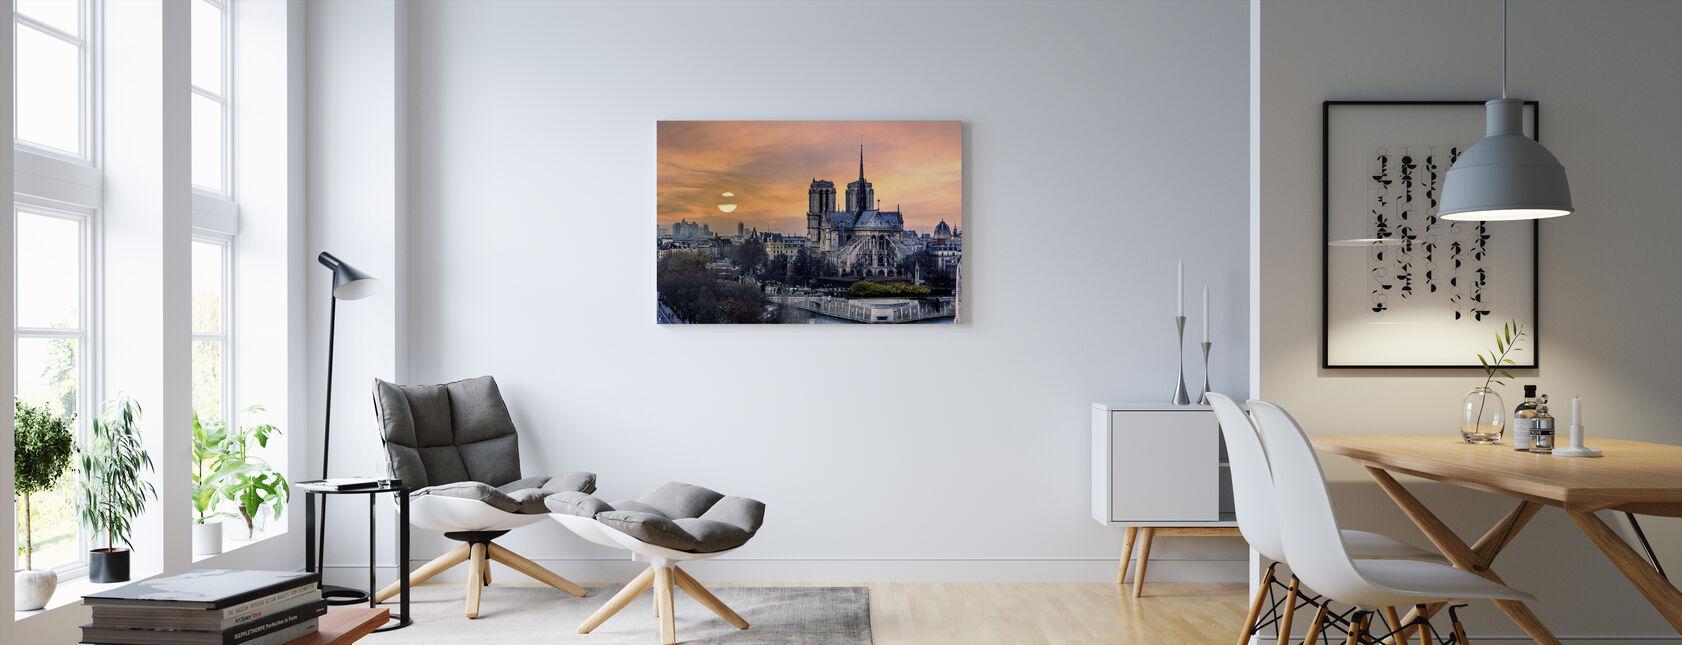 Gothic Pariisi - Canvastaulu - Olohuone